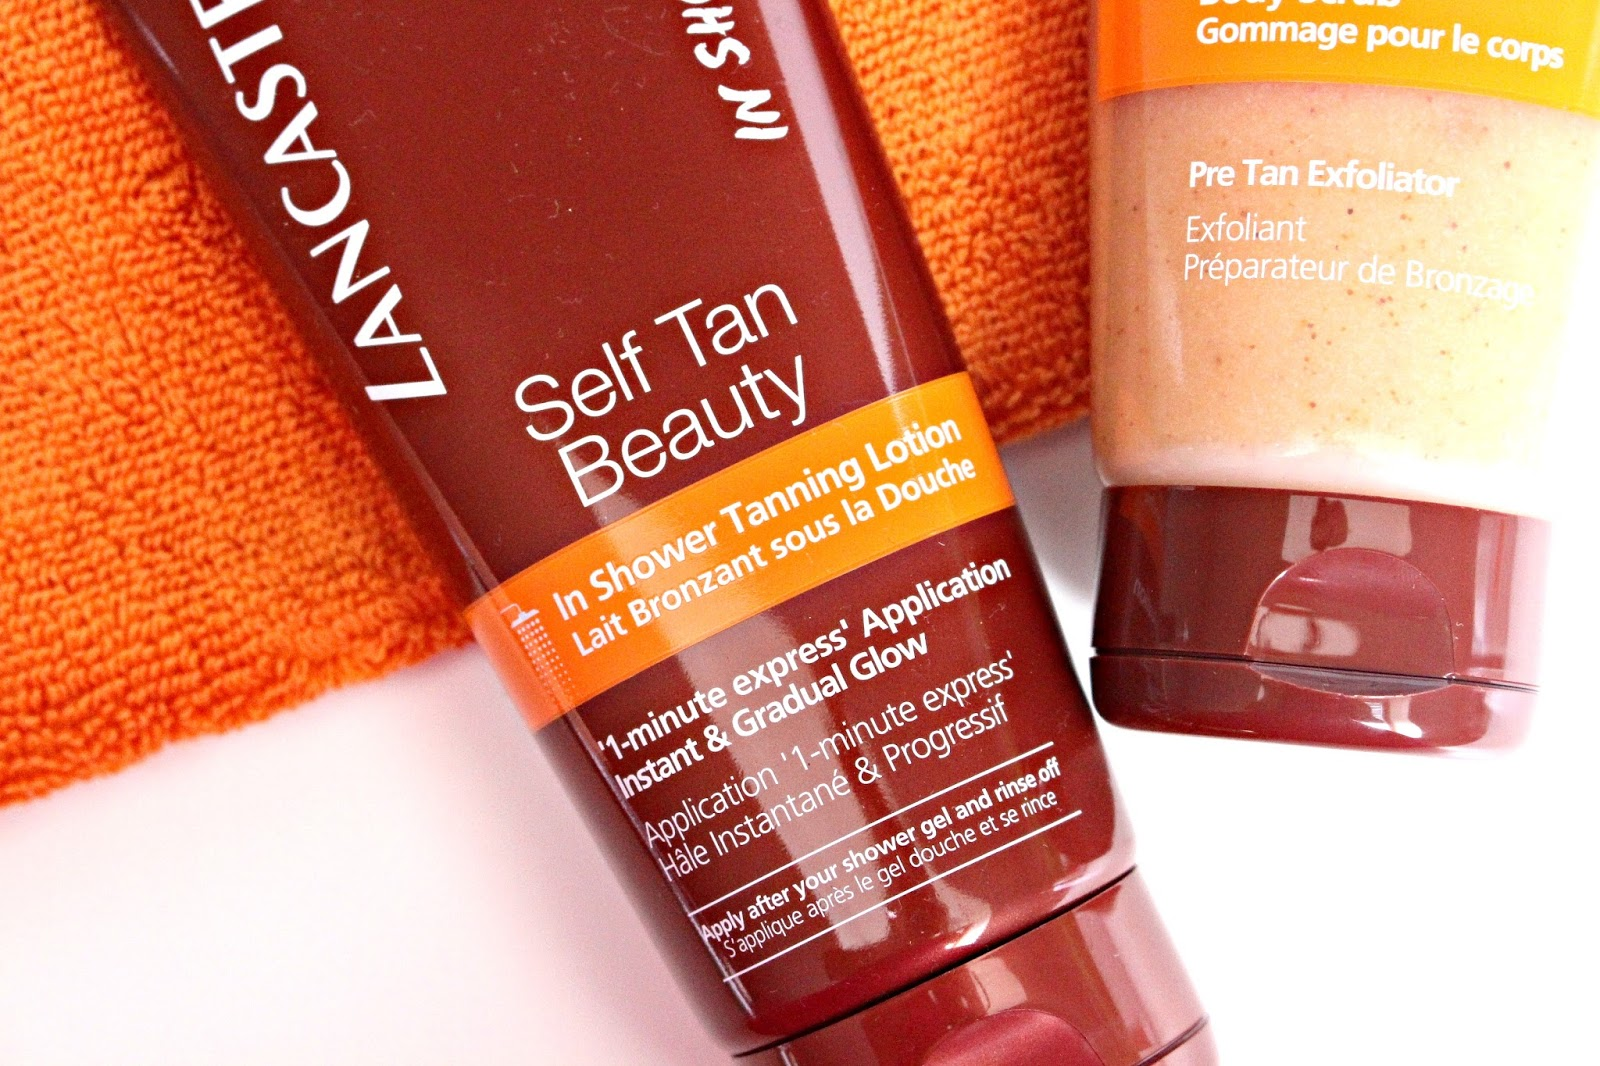 Lancaster Tan Preparer en In Shower Tanning Lotion